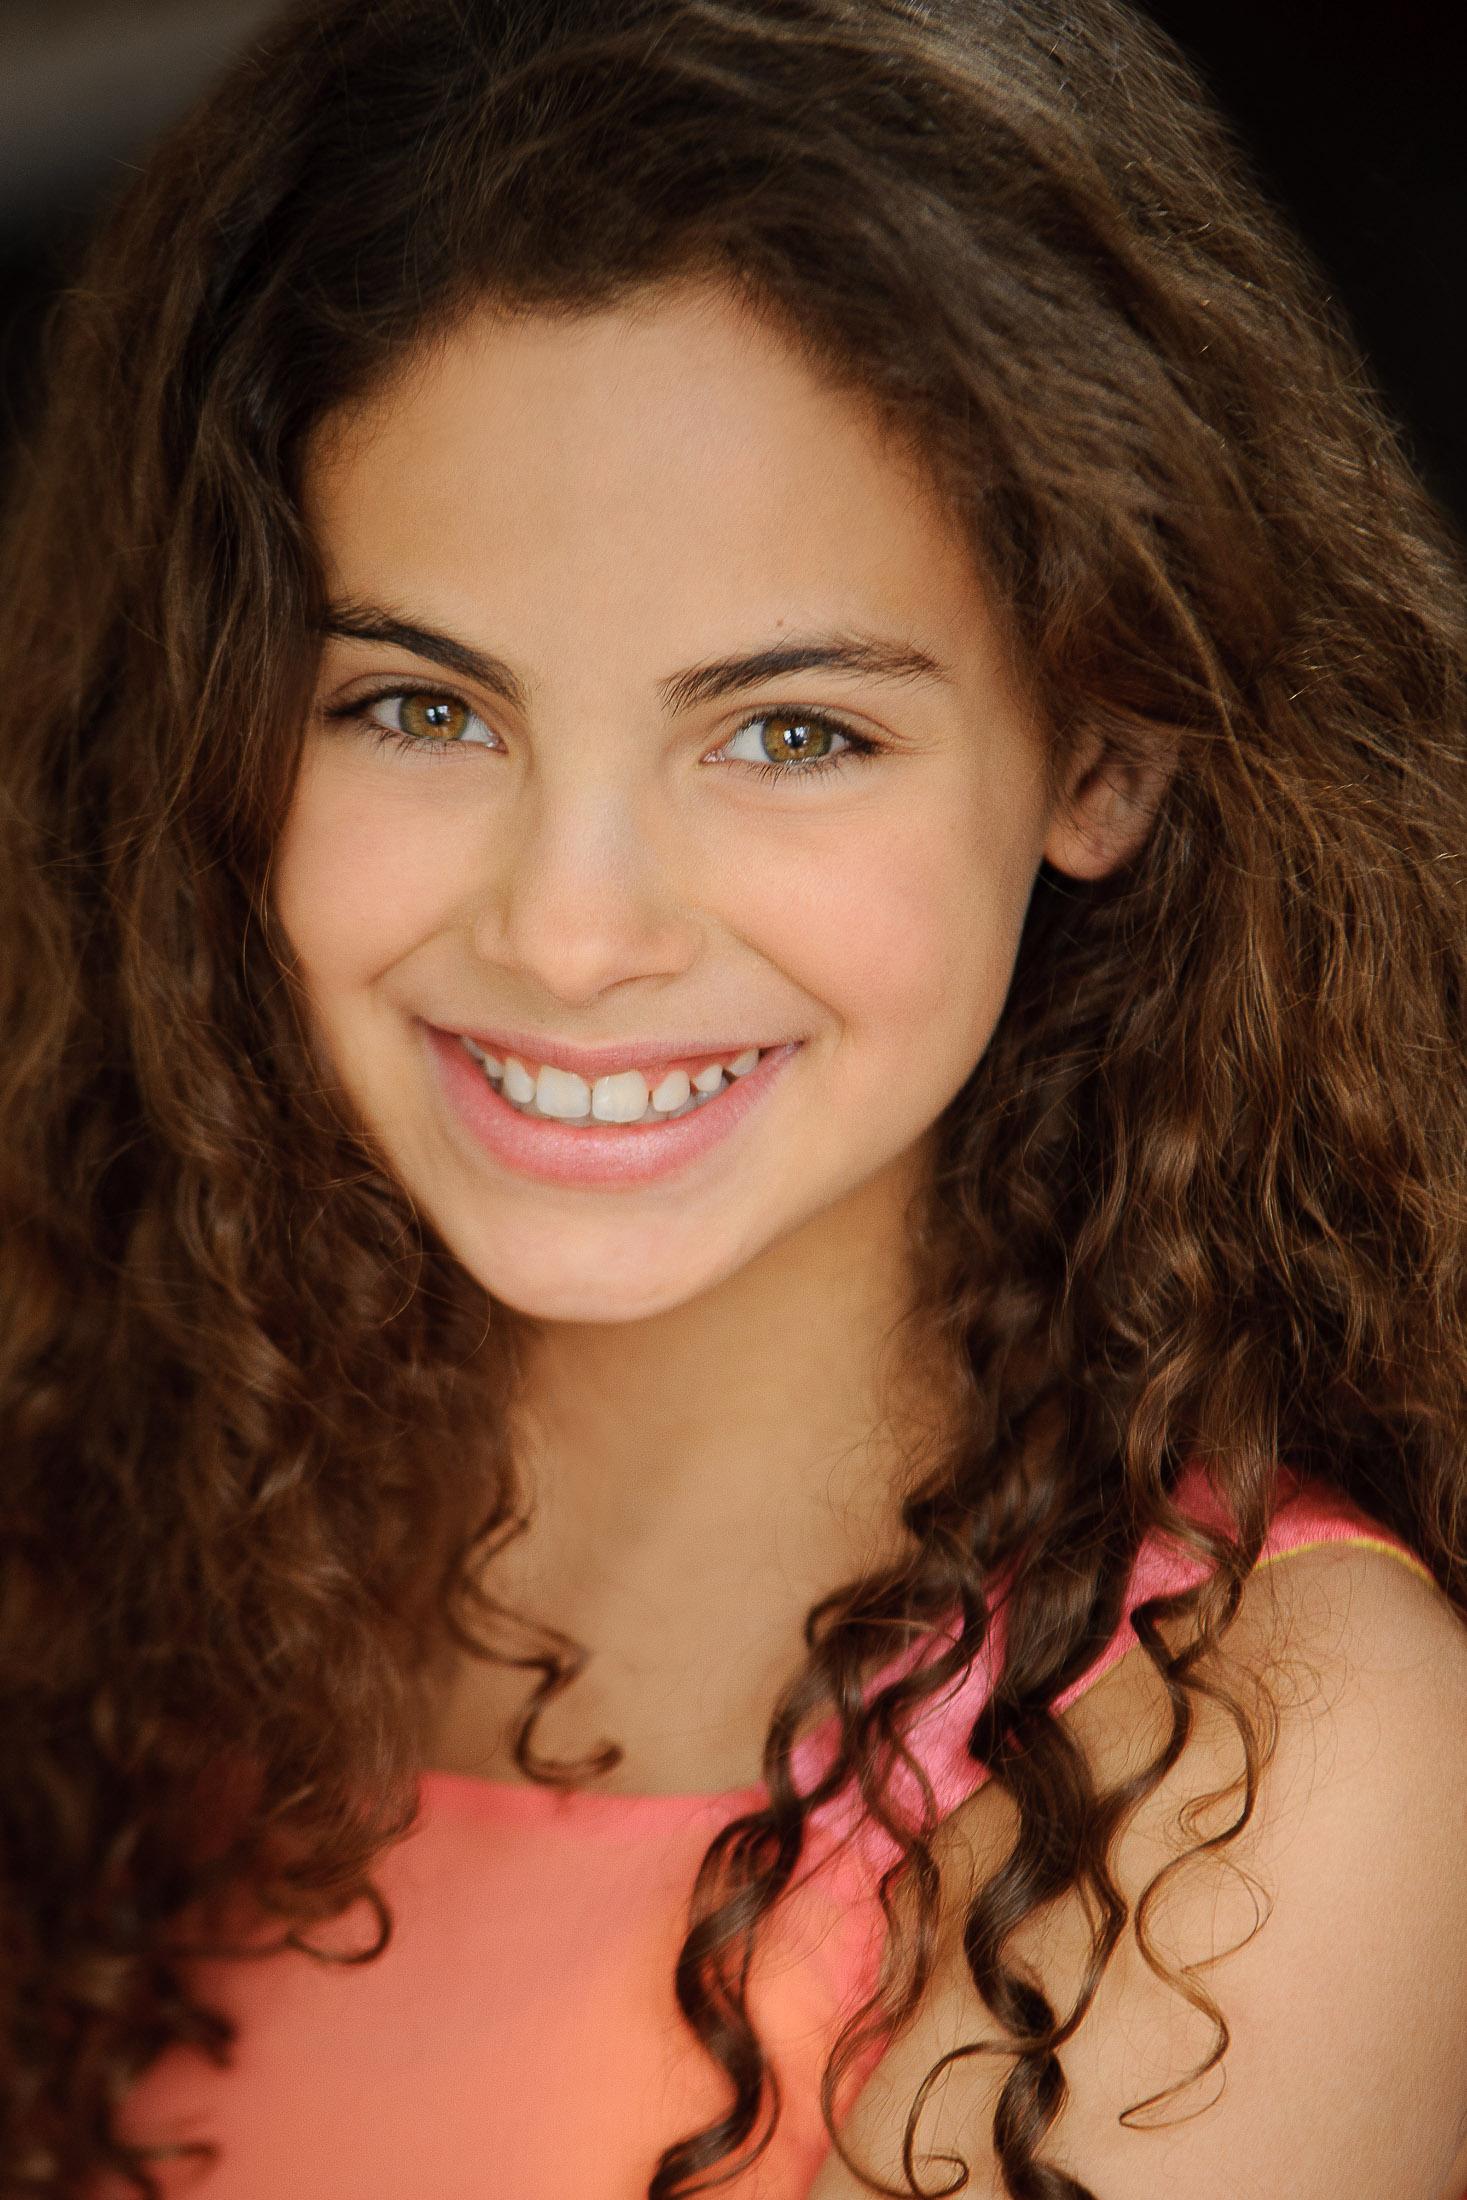 Headshots NYC - Actor Headshots Samantha P